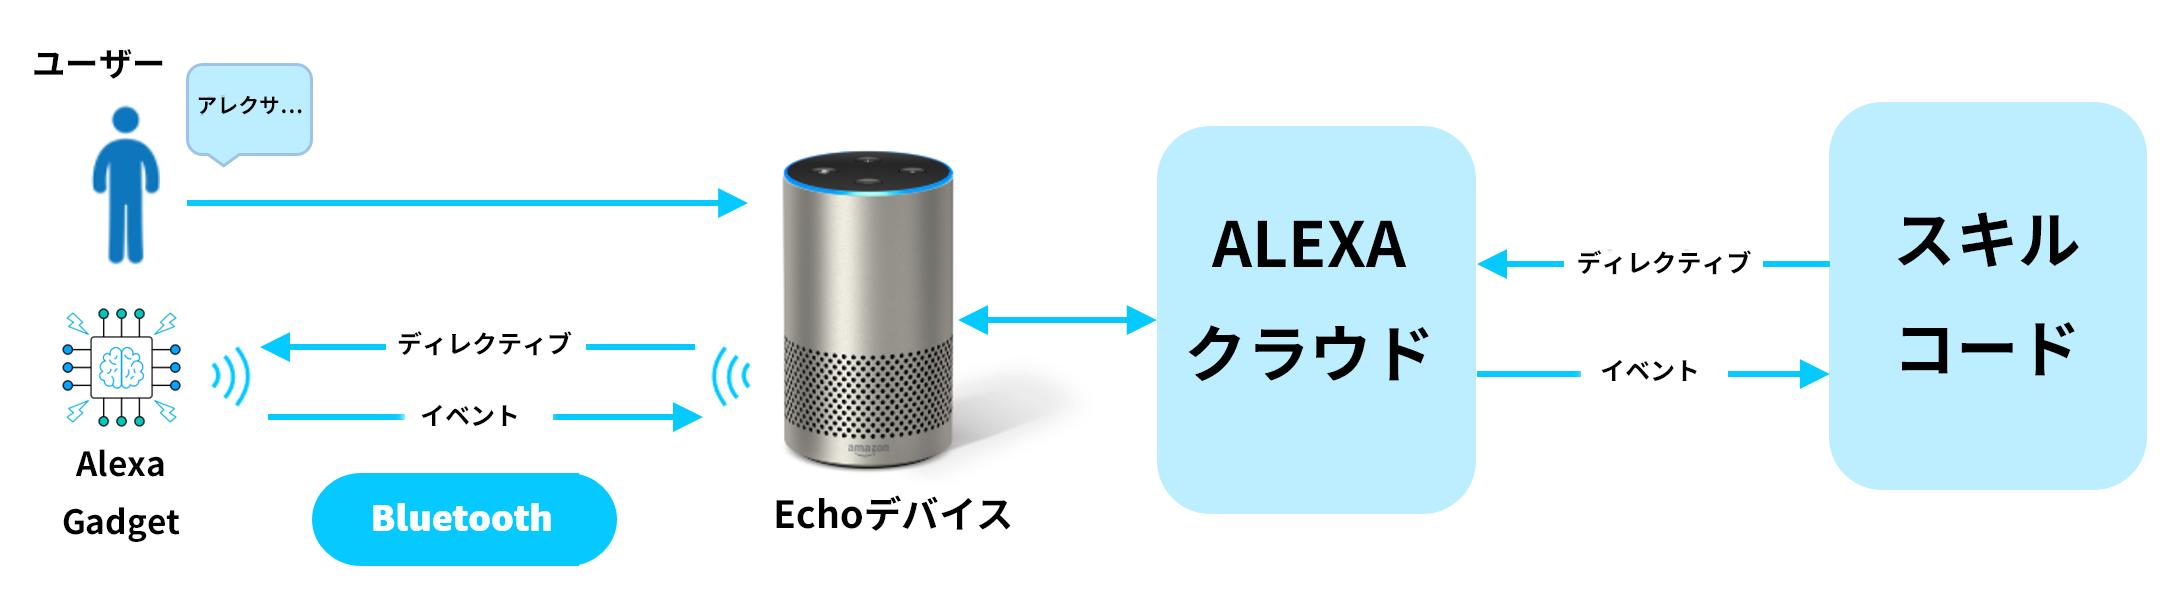 Alexa Gadgetsの概要